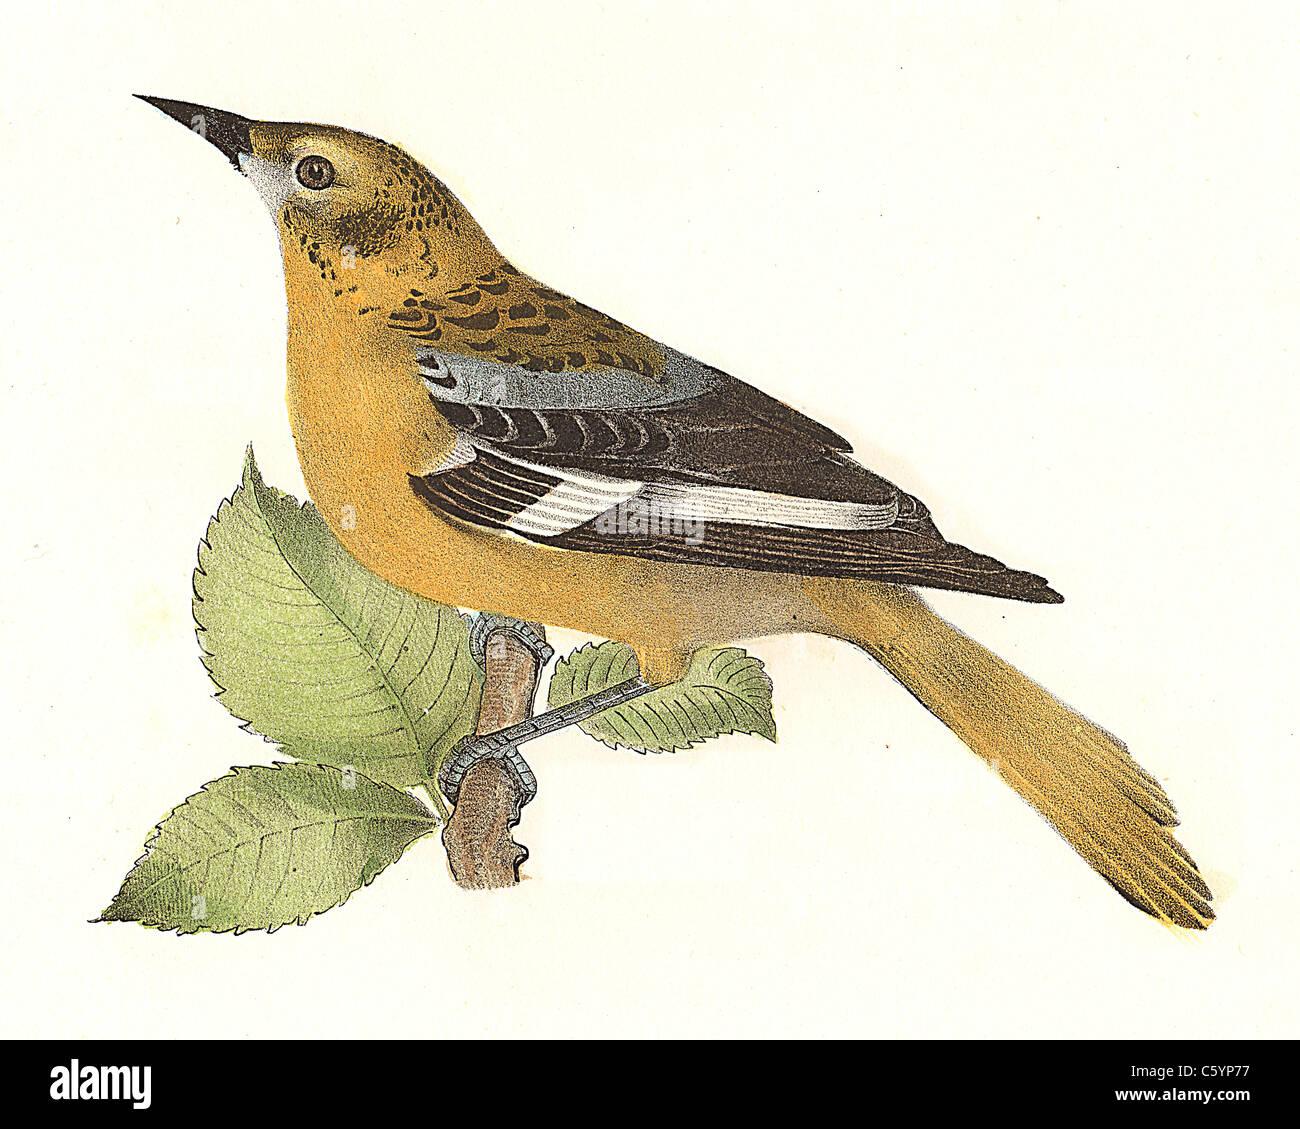 La Oropéndola o Baltimore oriole, hembra (ictericia baltimore, ictericia galbula) vintage litografía de aves - James de Kay, zoología de NY, Aves Foto de stock